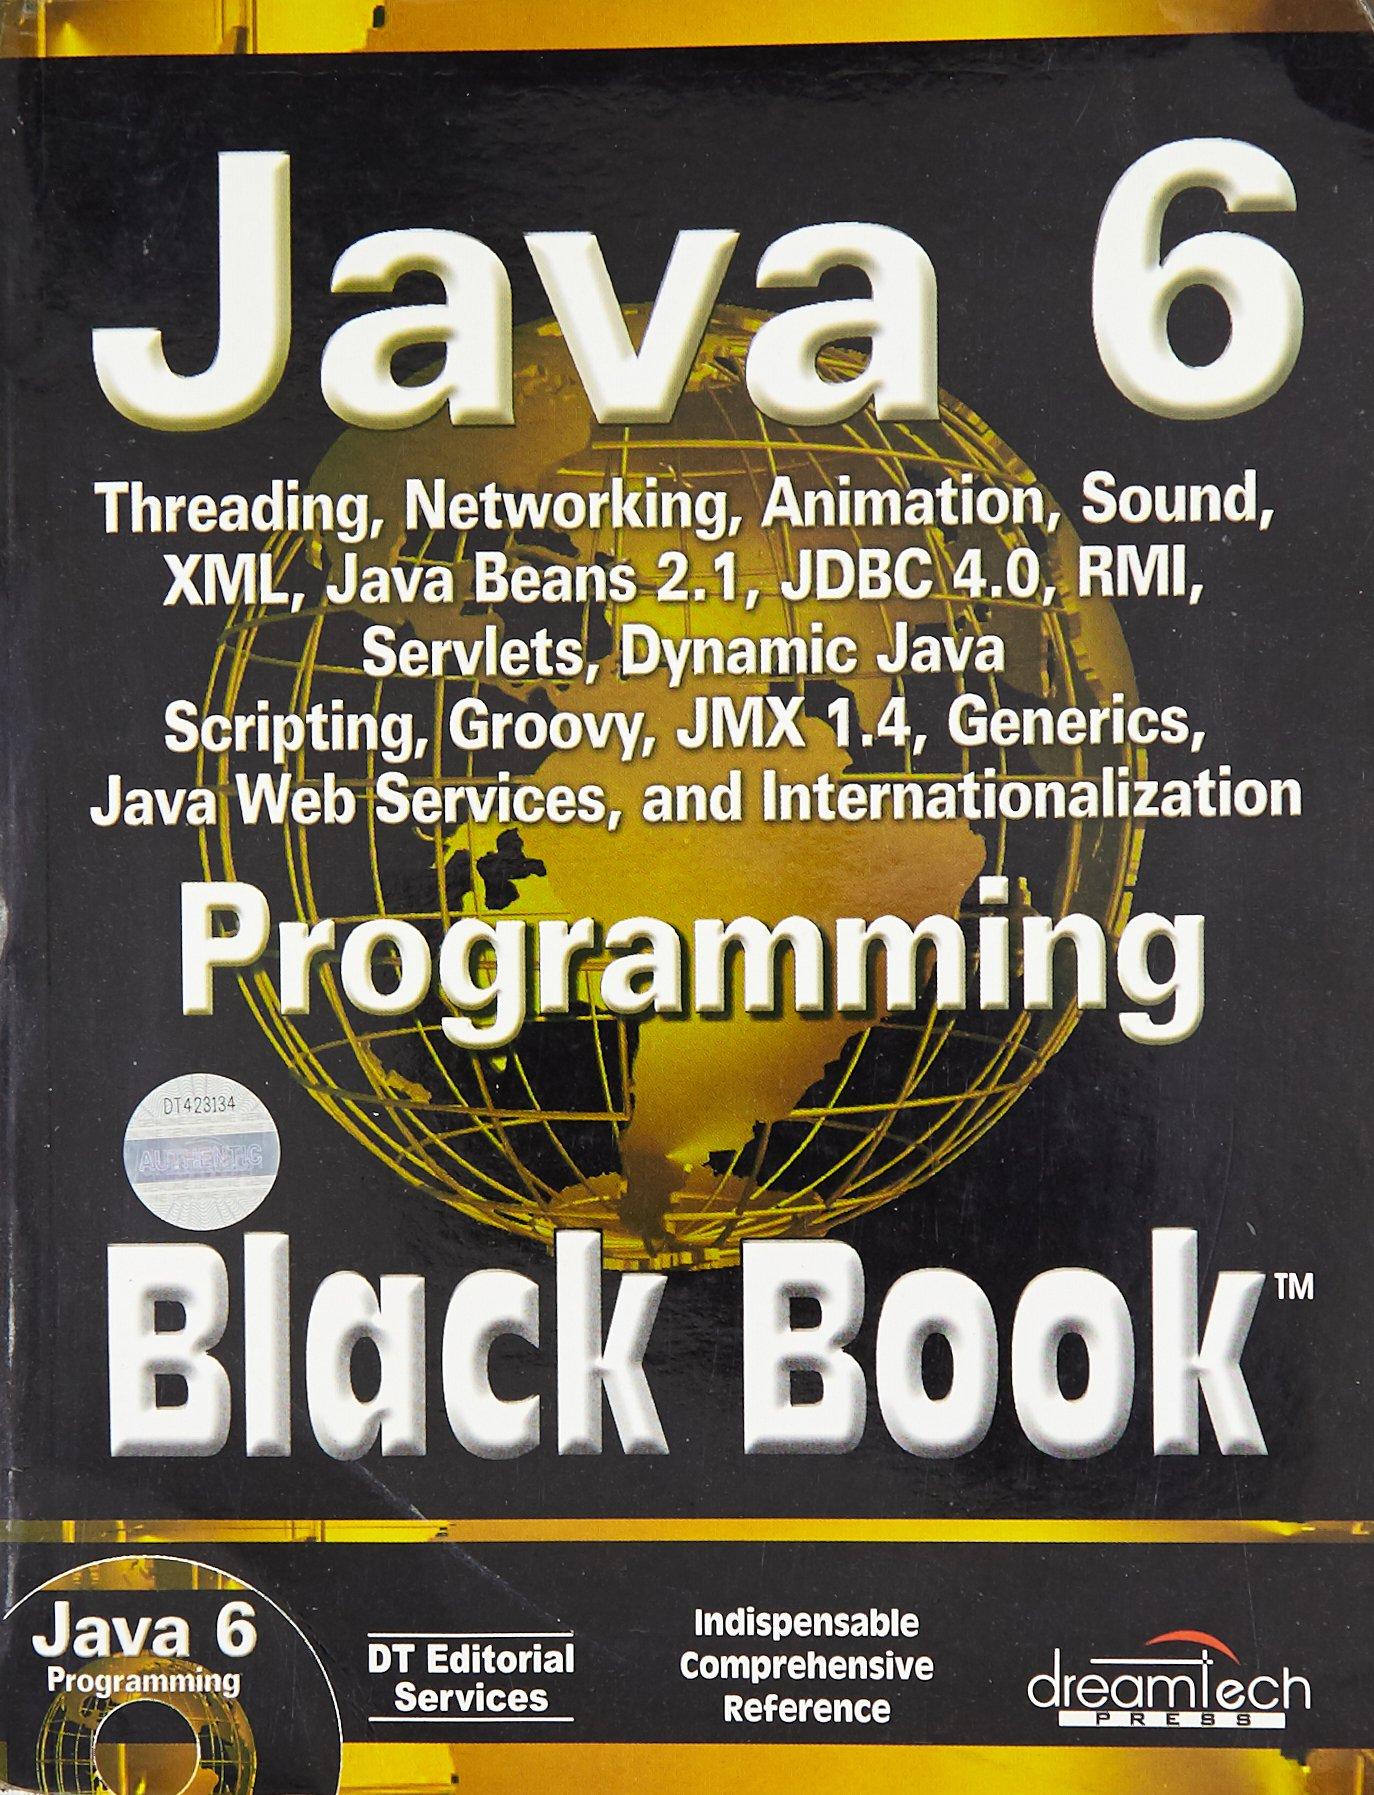 Java 6 Programming Black Book, 2007ed